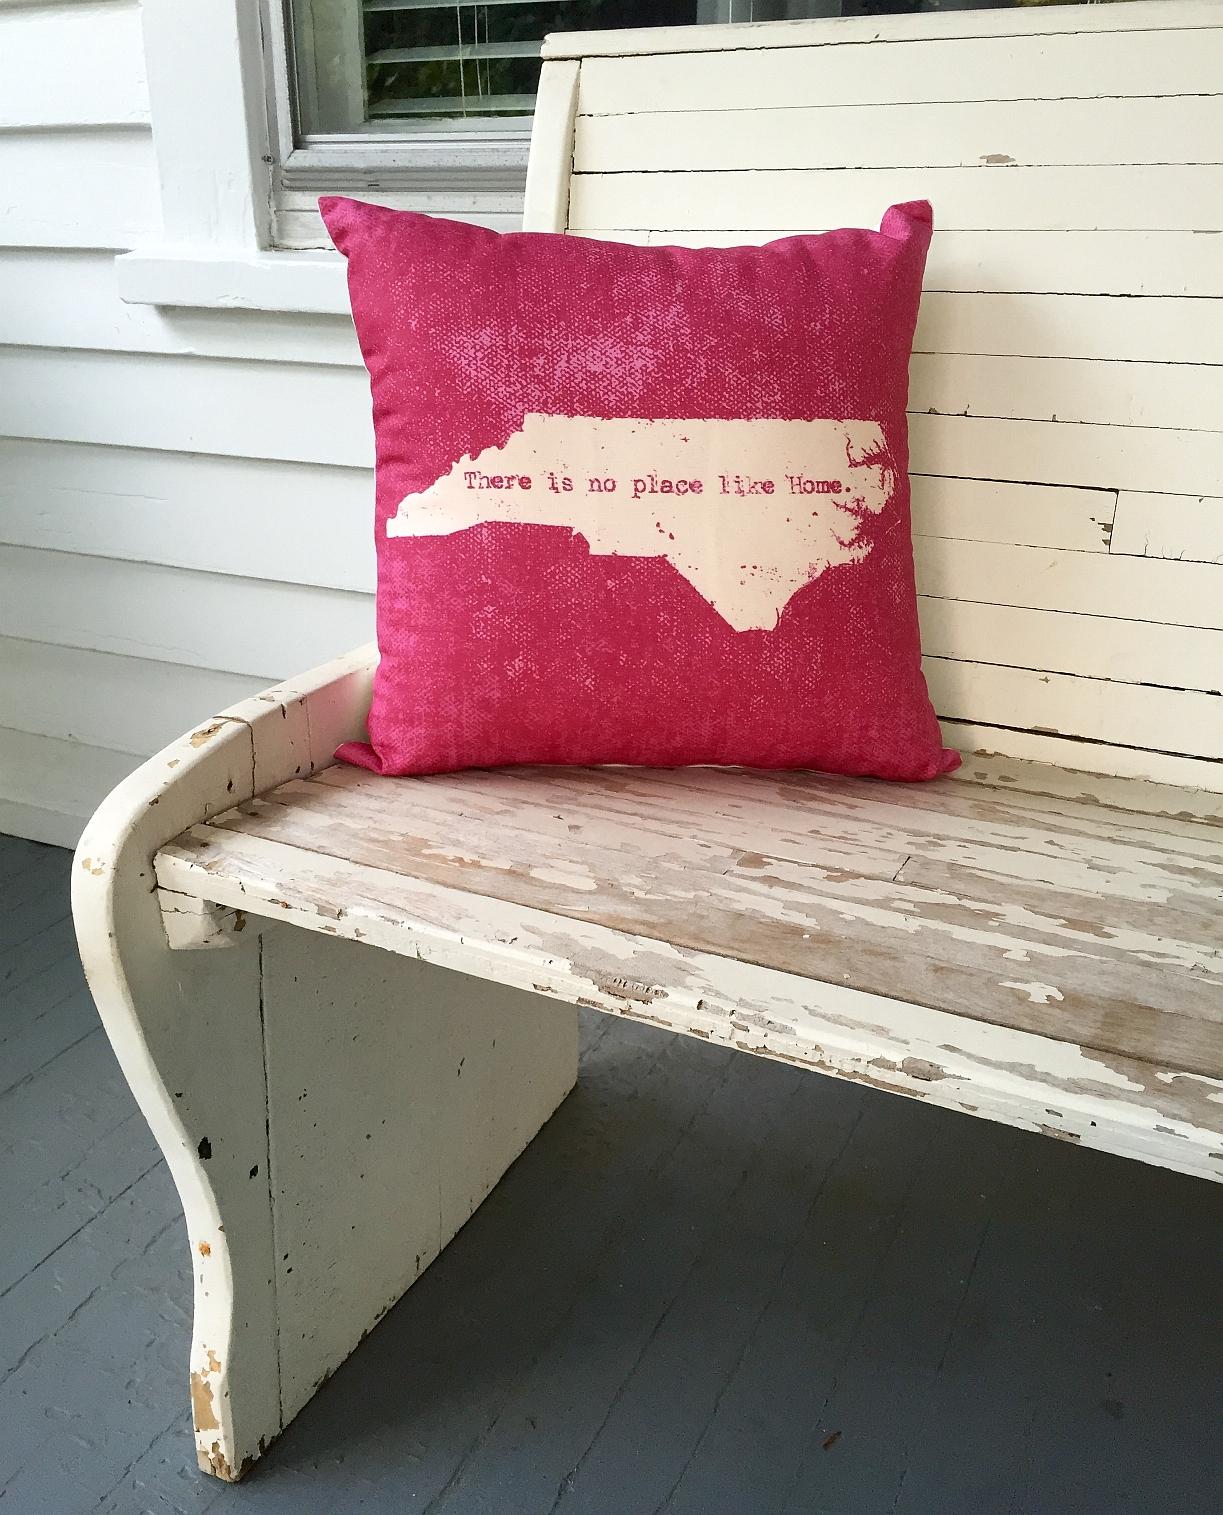 Red-pillow - Design Archivesu2122 Emporium: Greensboro and Winston-Salem